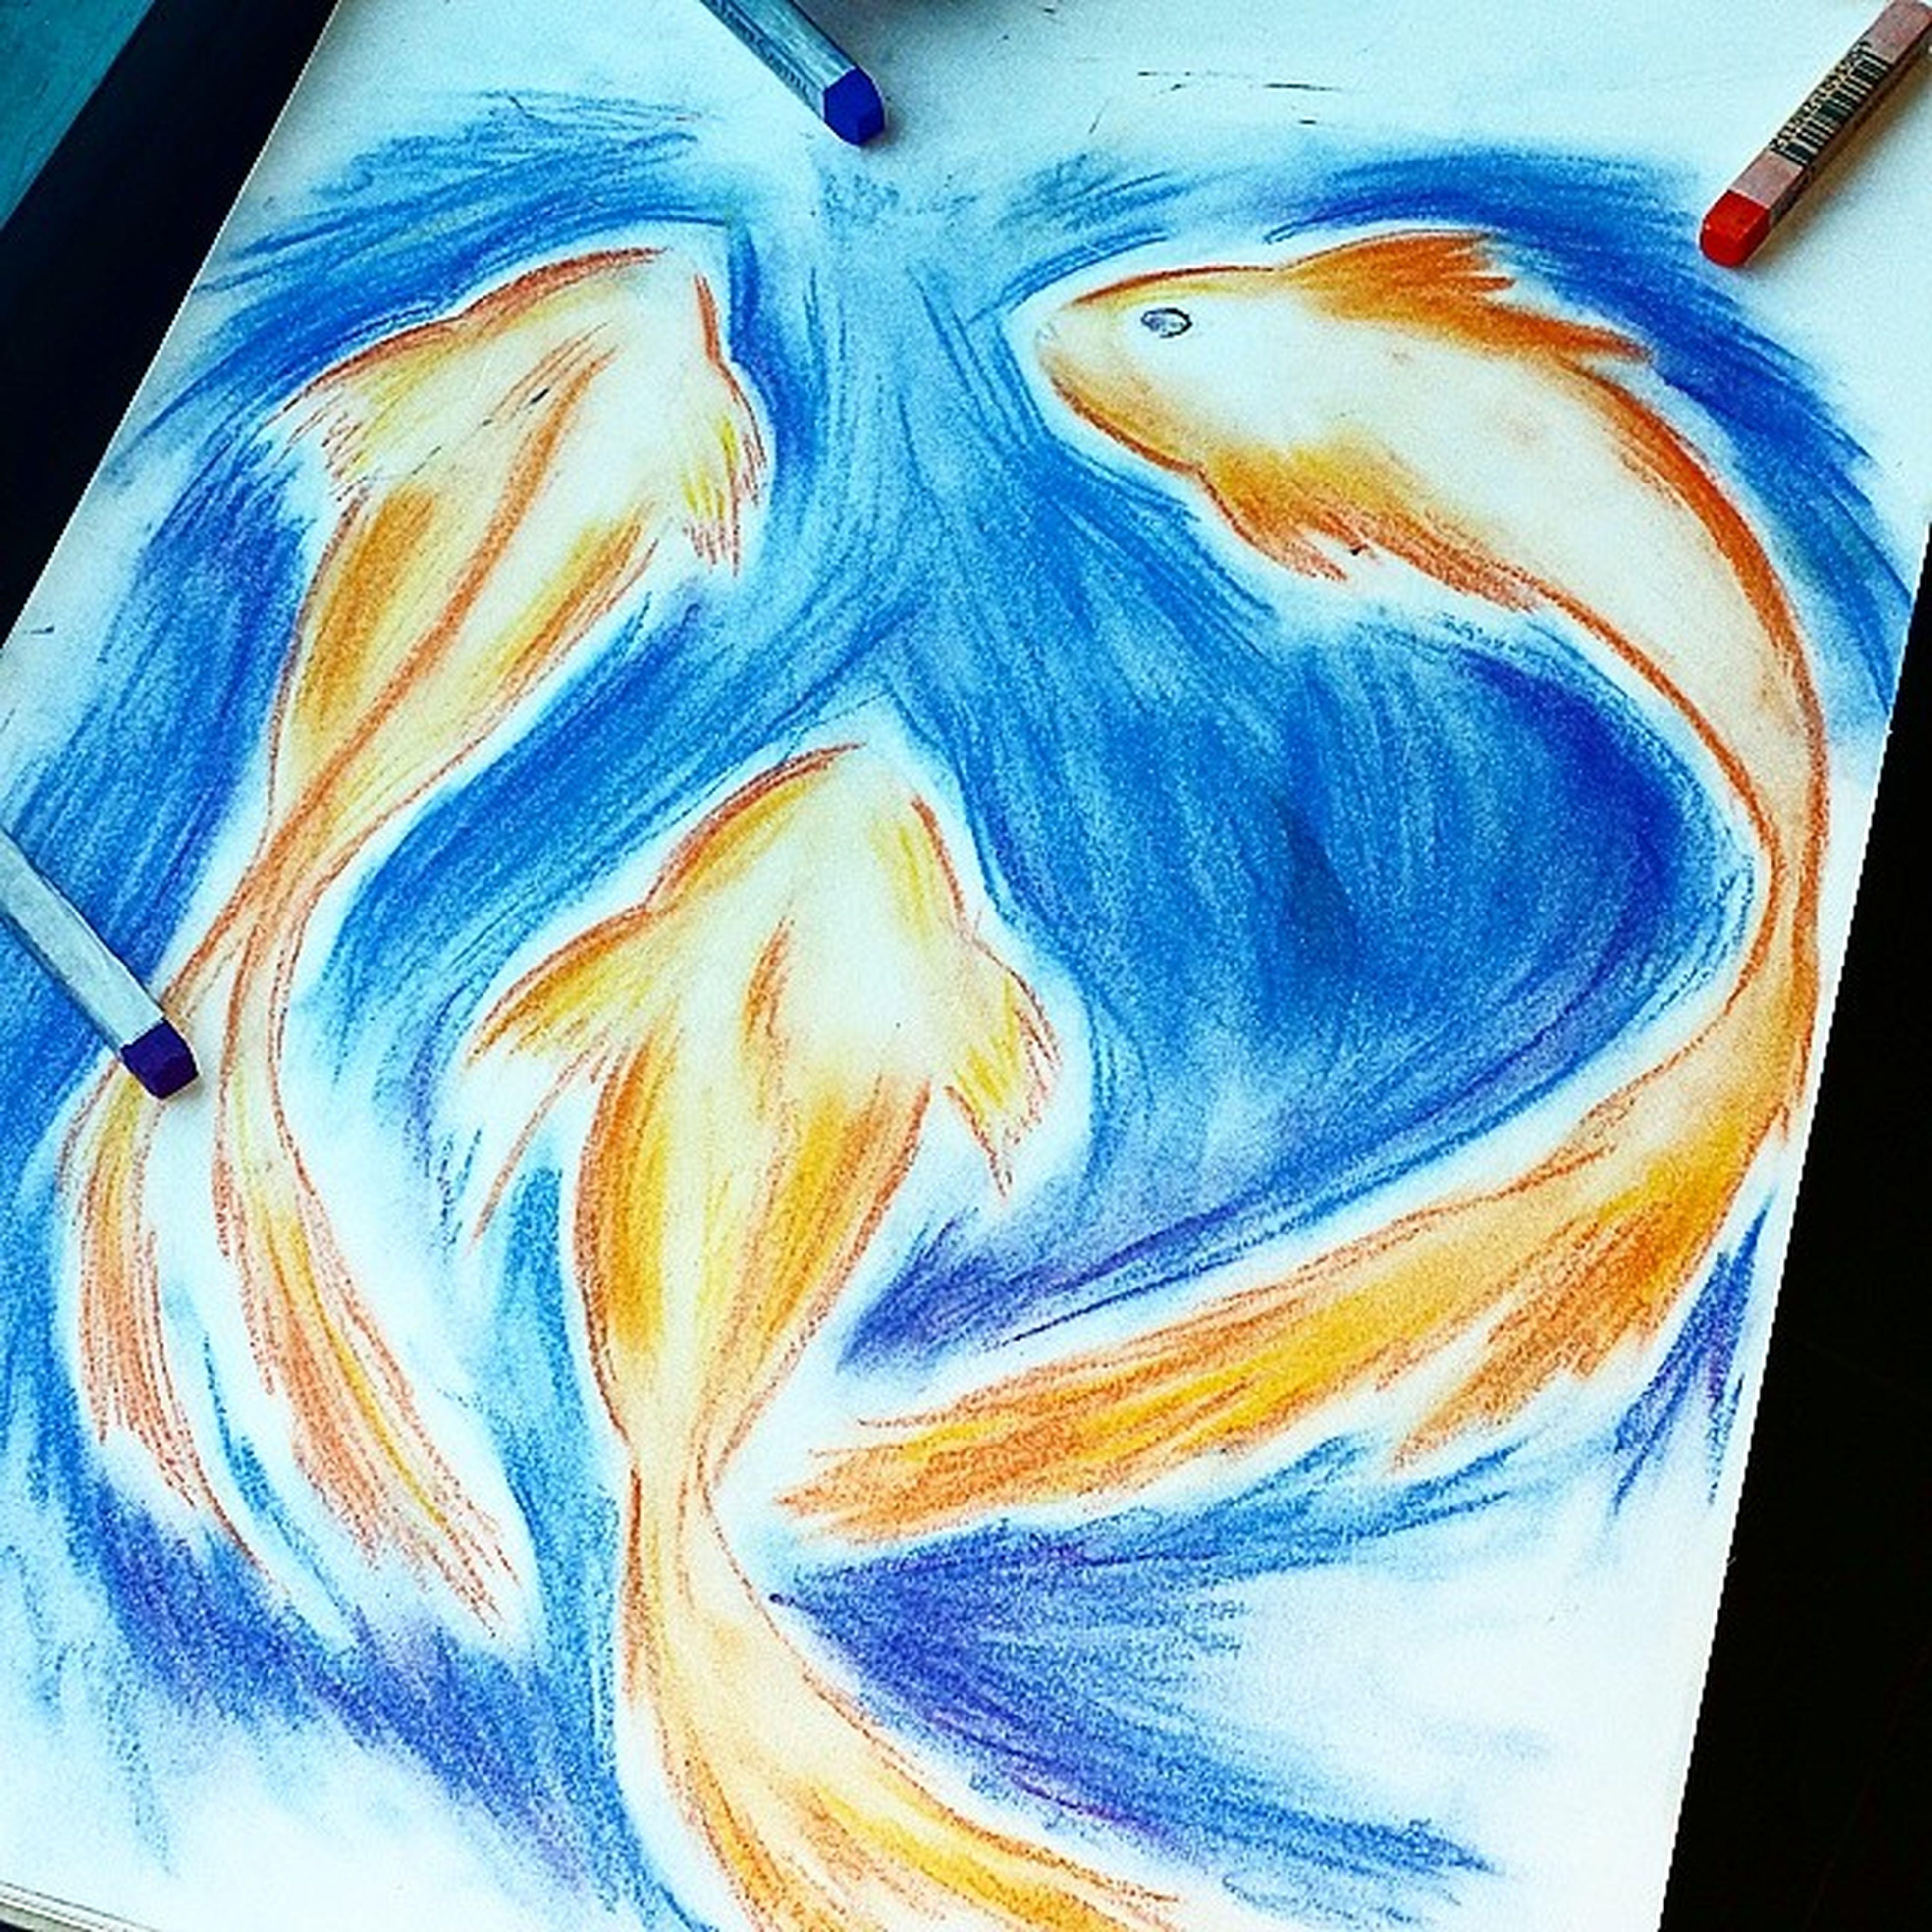 Threefish beauty